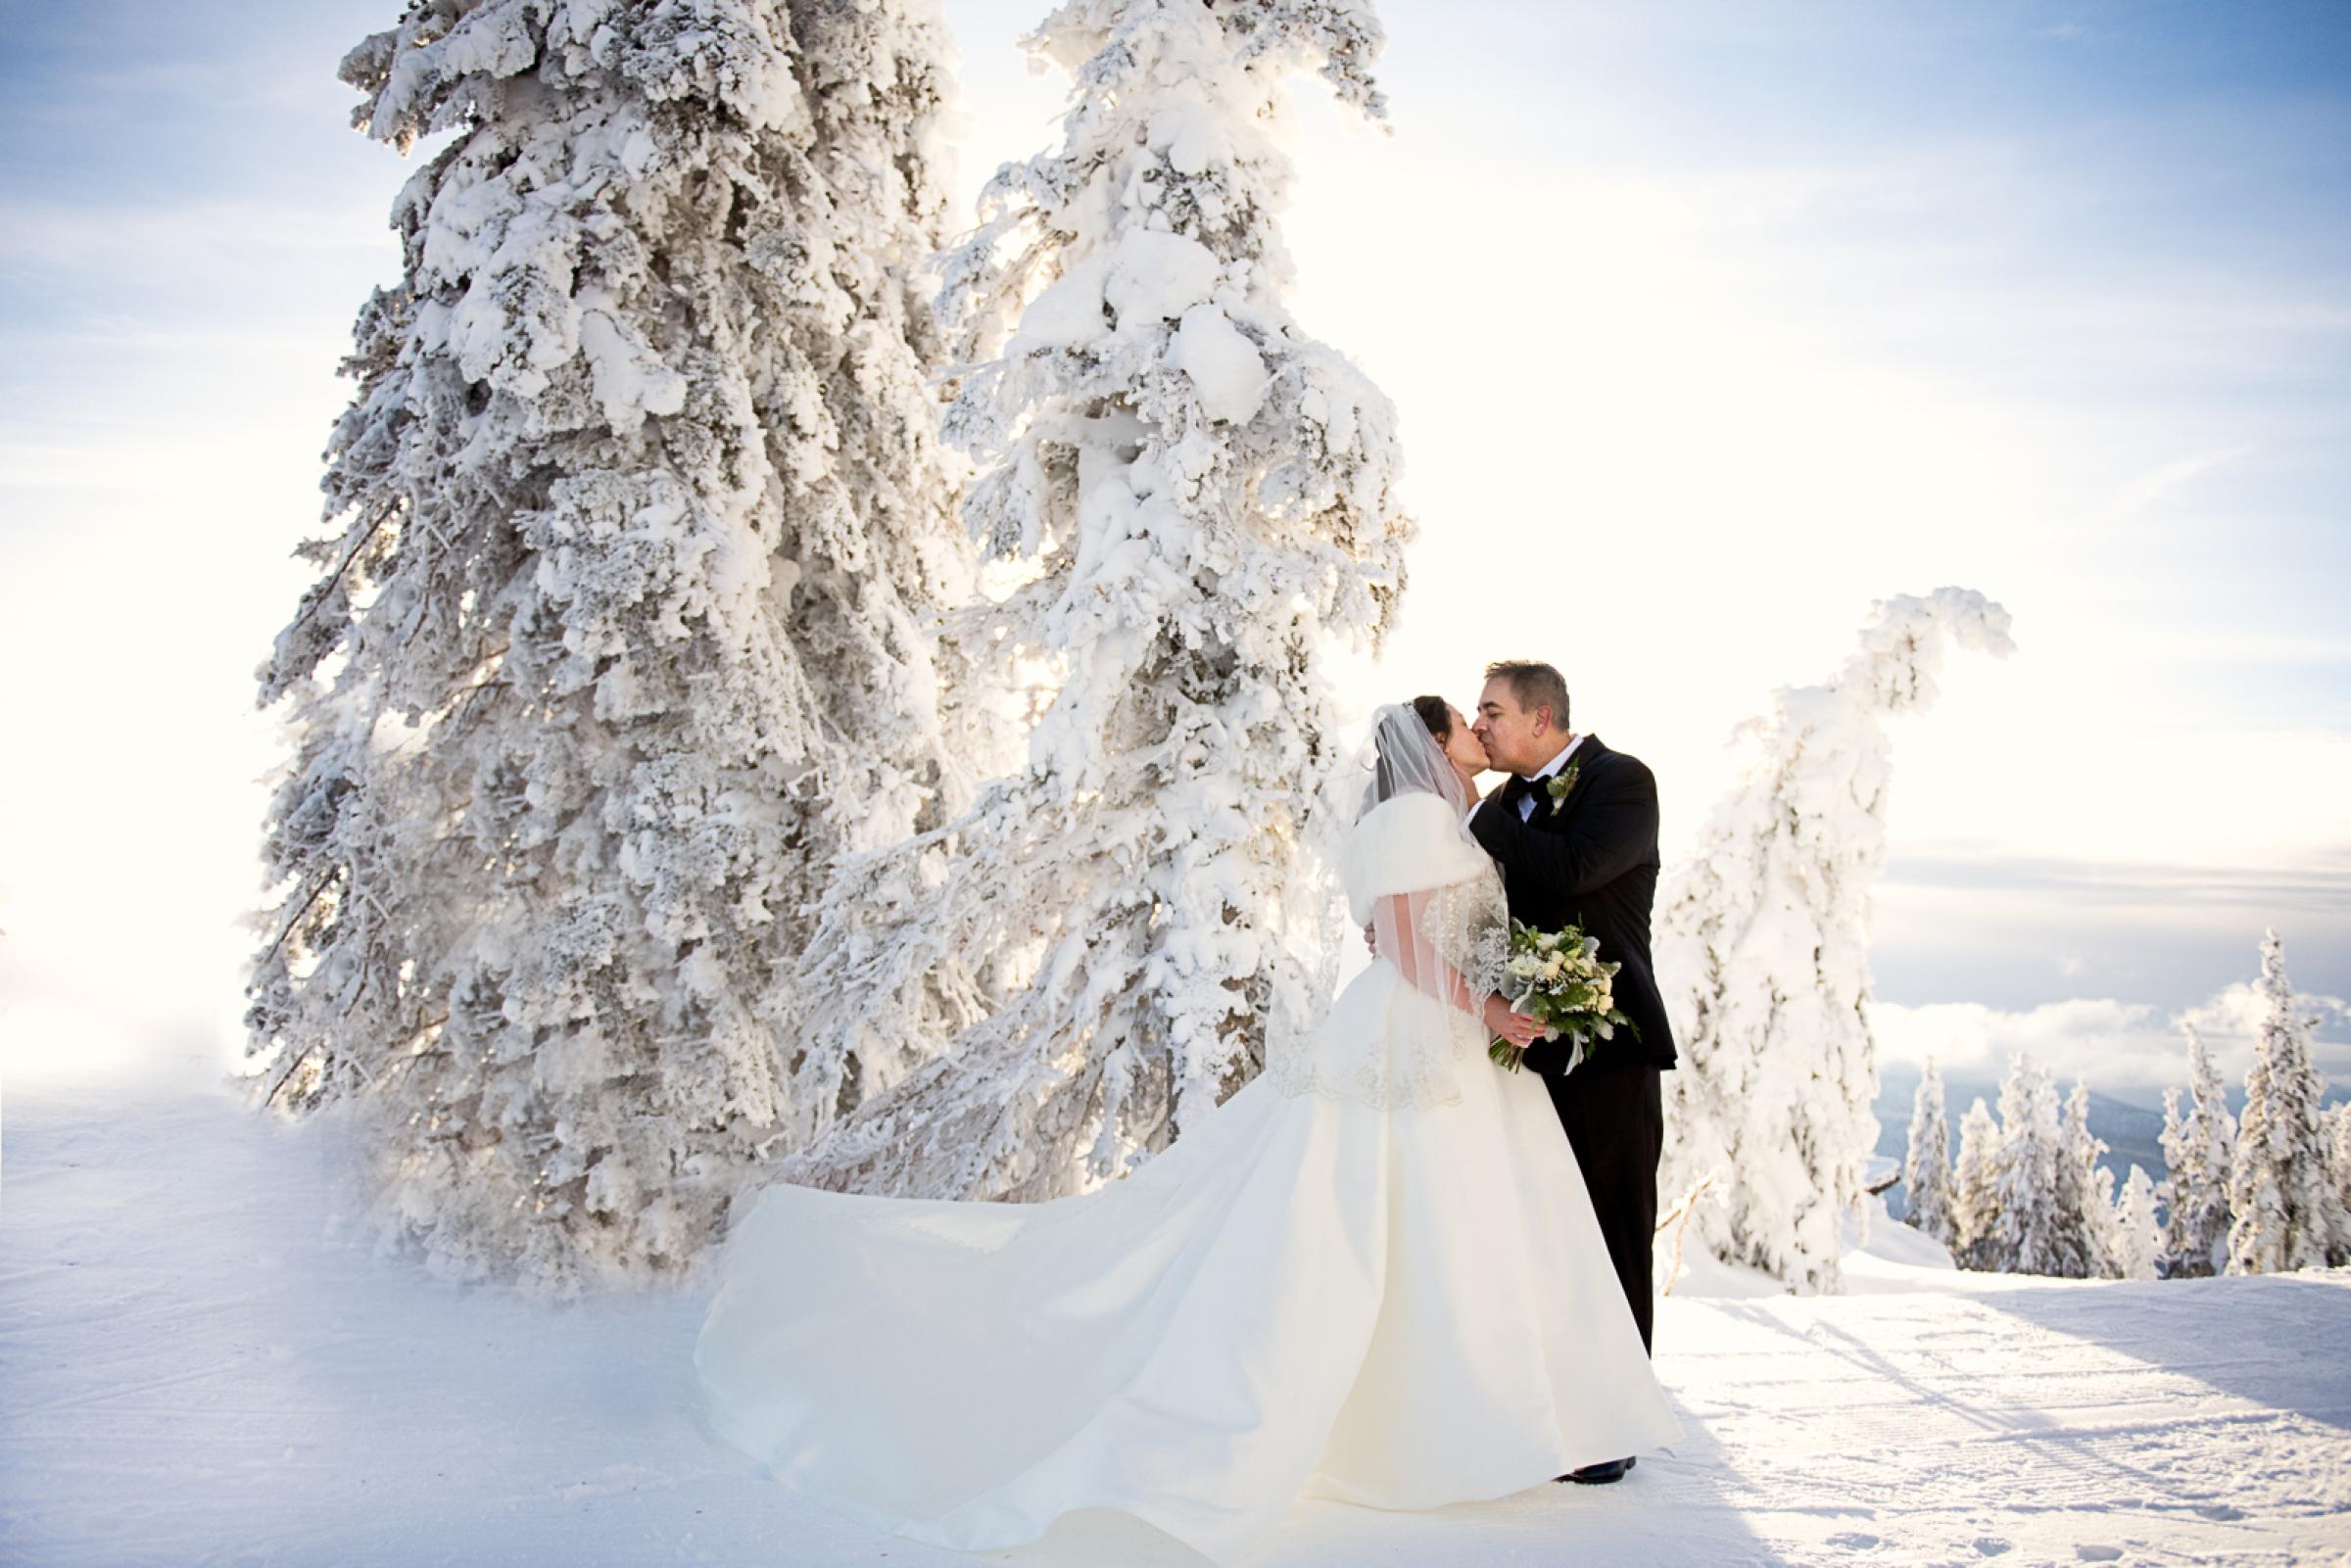 Janel-Gion-Wedding-Photographer-KristinRon-Sandpoint-Idaho.jpg_0014.jpg